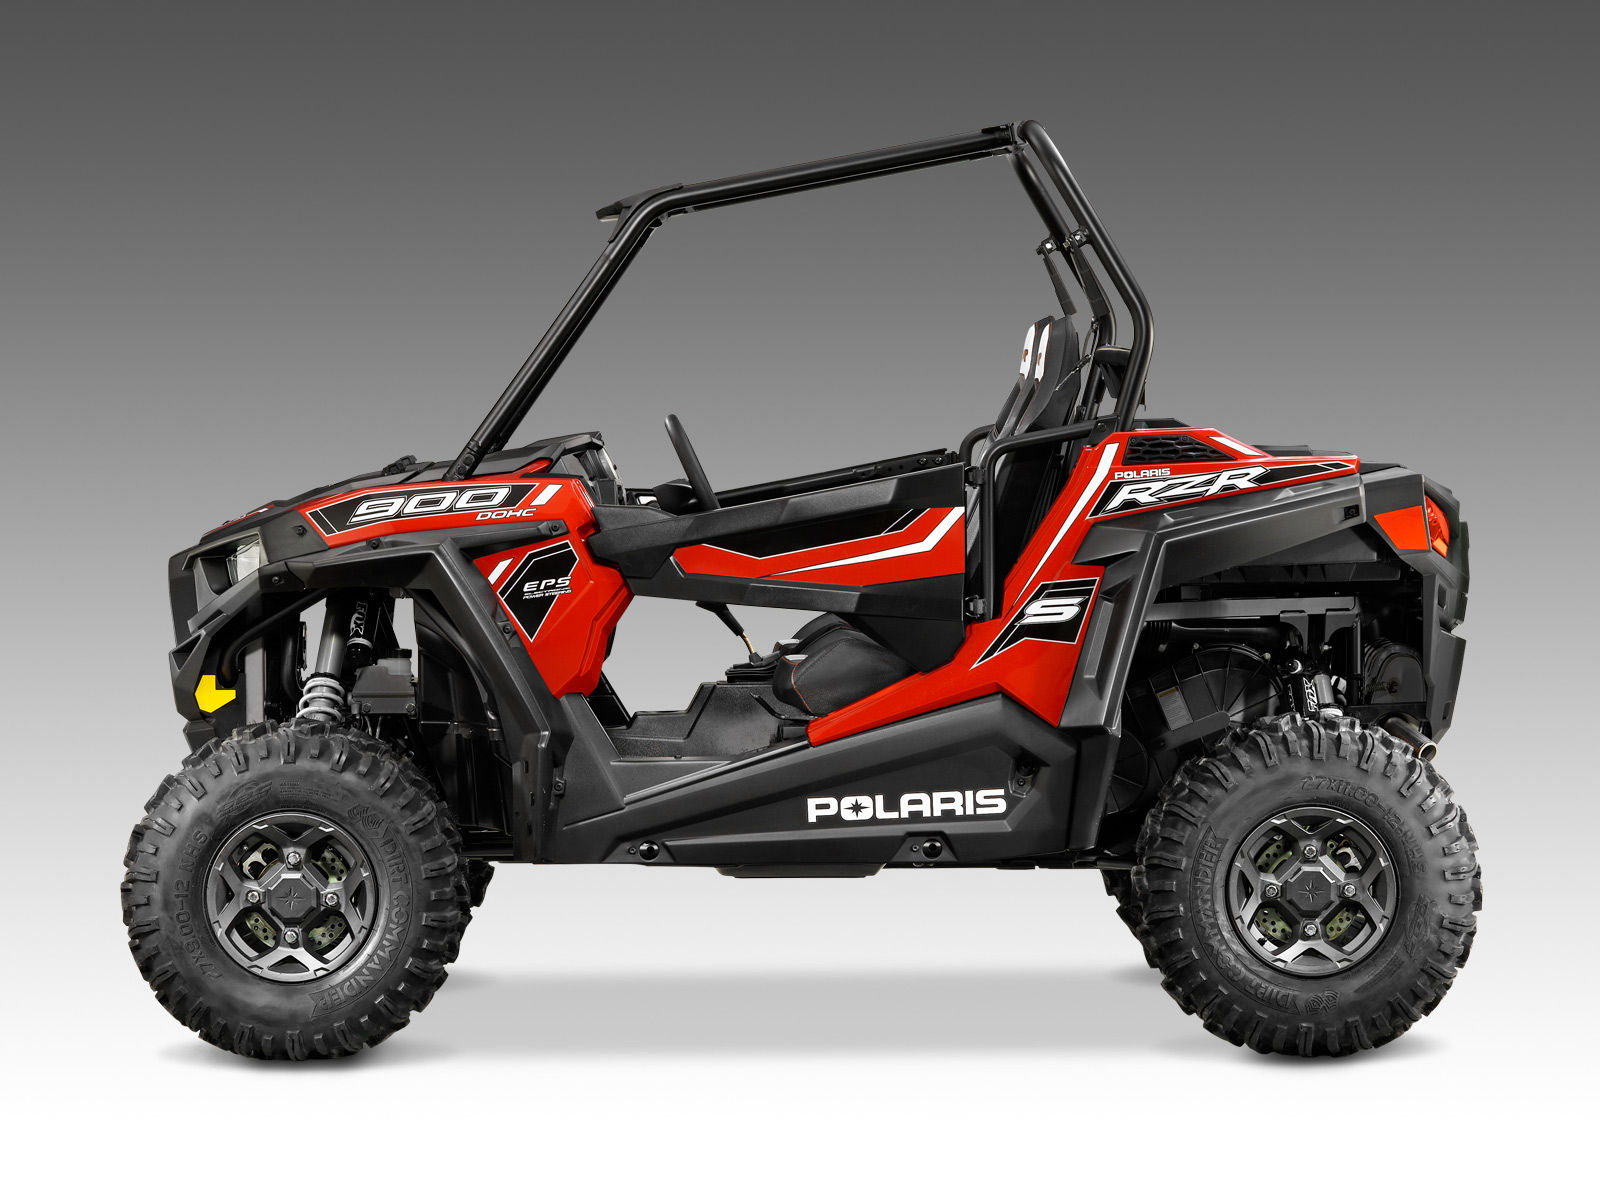 2015-RZR-900-S-eps-HRedPearl_Prfl